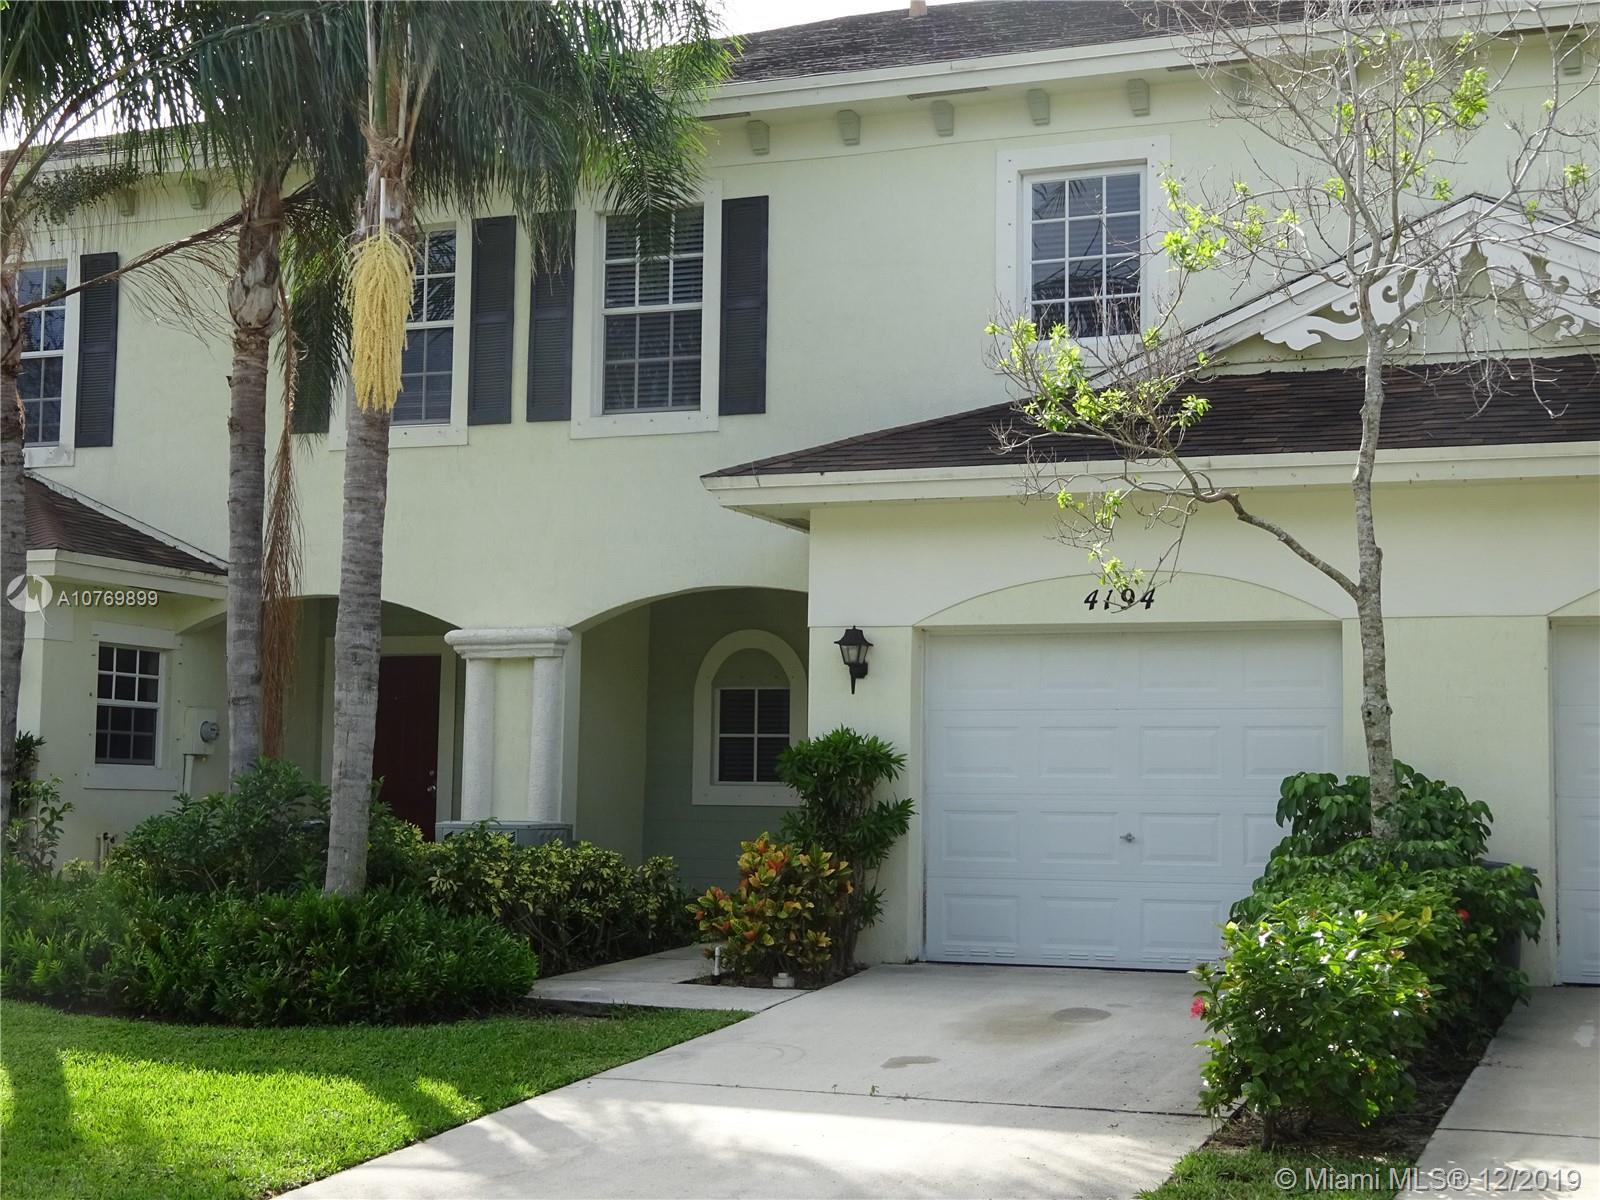 4194 Emerald Vista Way 4194, Lake Worth, FL 33461